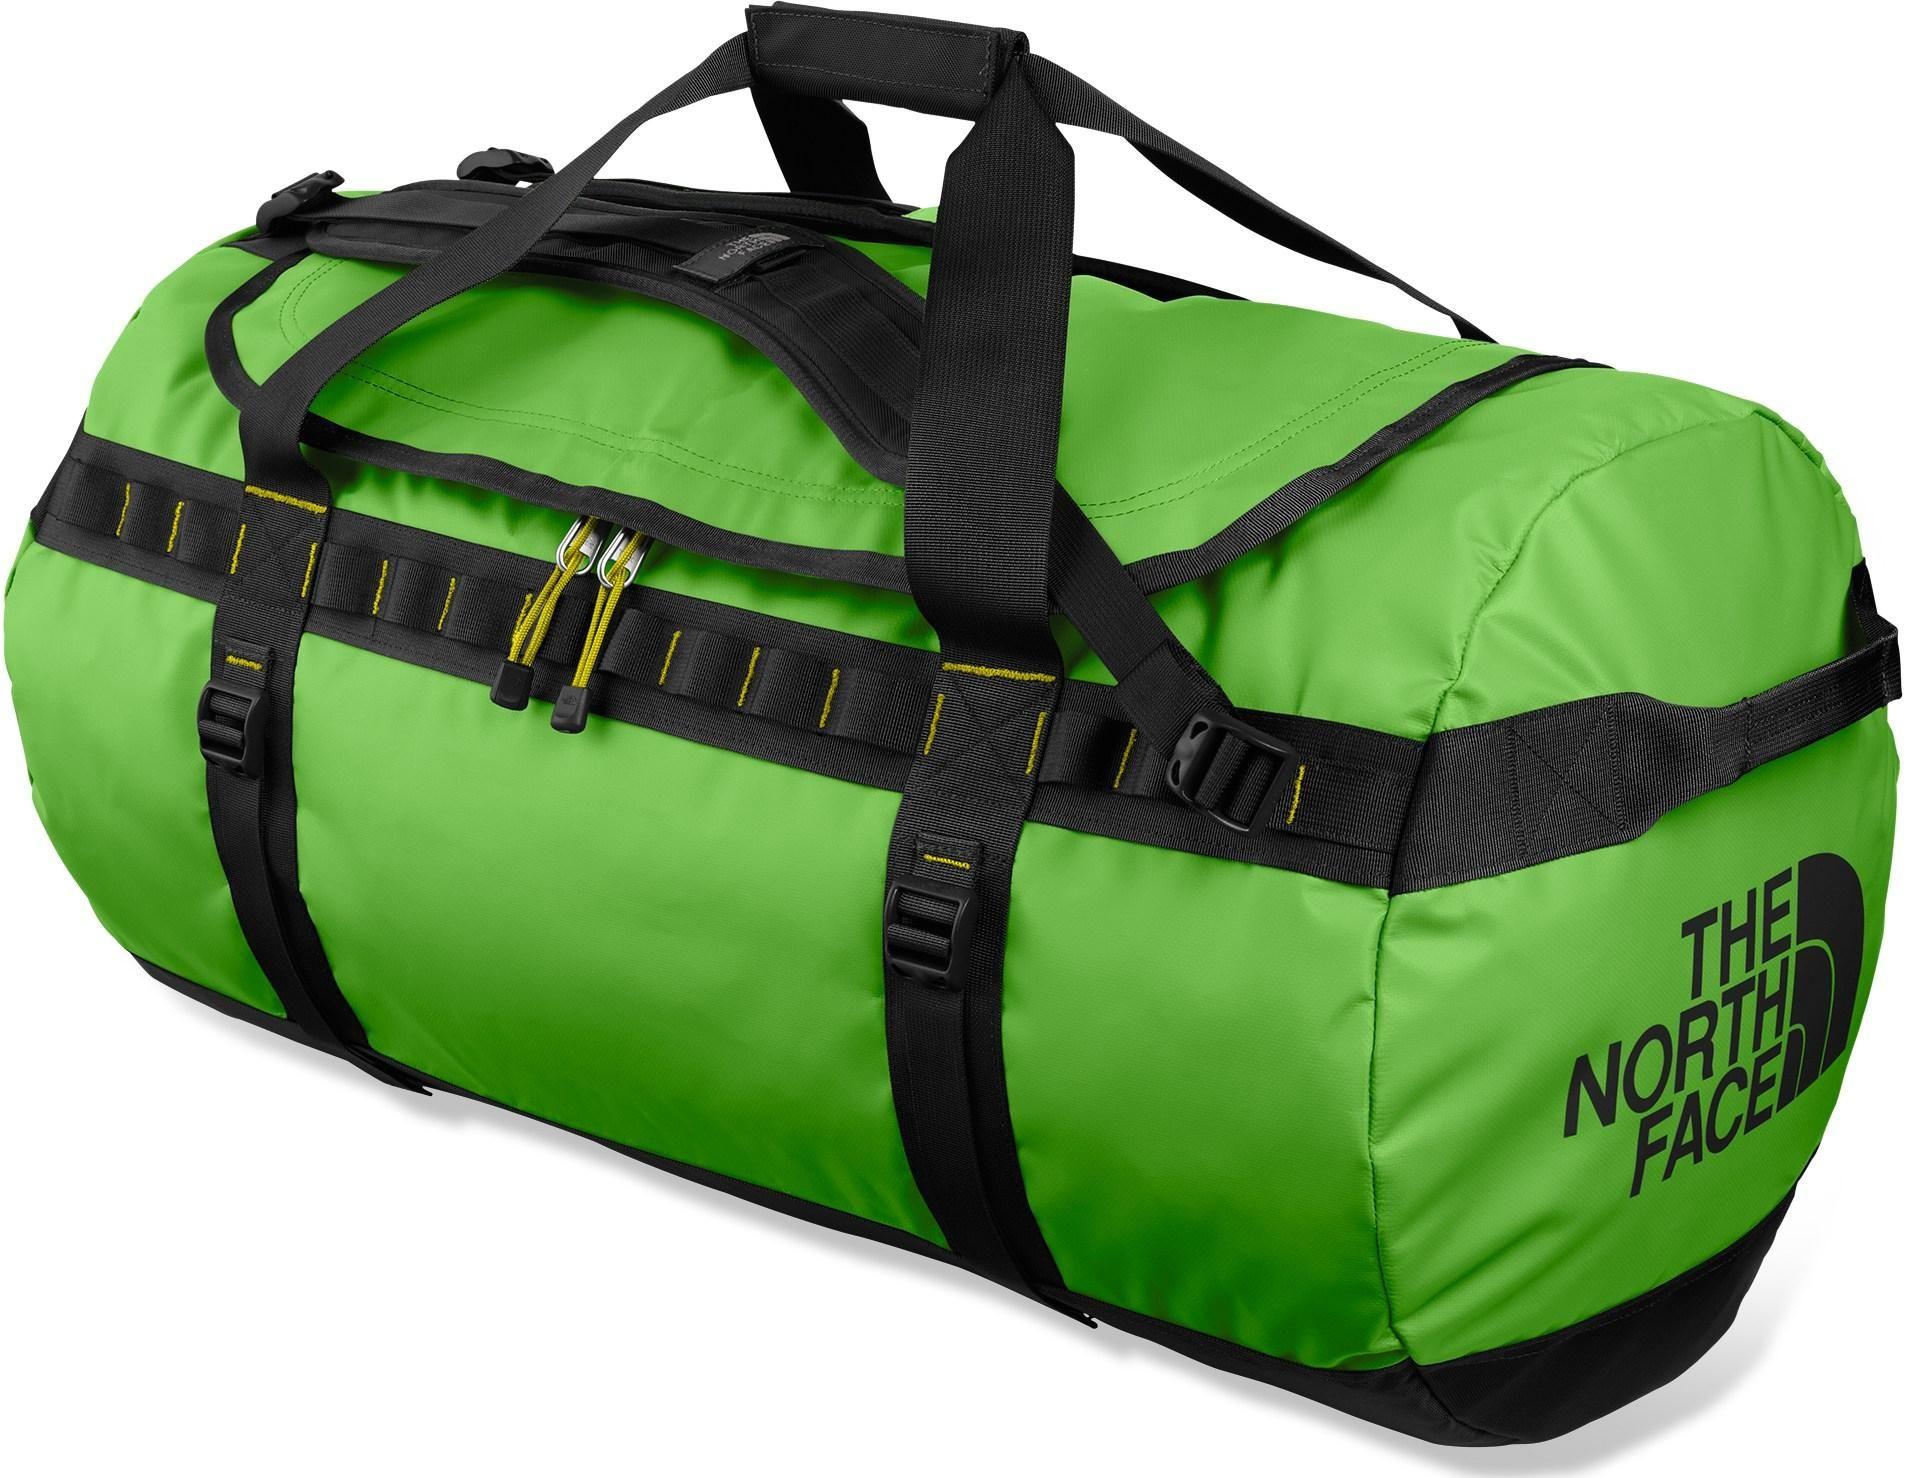 f9c381021 Base Camp Duffel - Large   Car Camping   Duffel bag, Bags, Camping